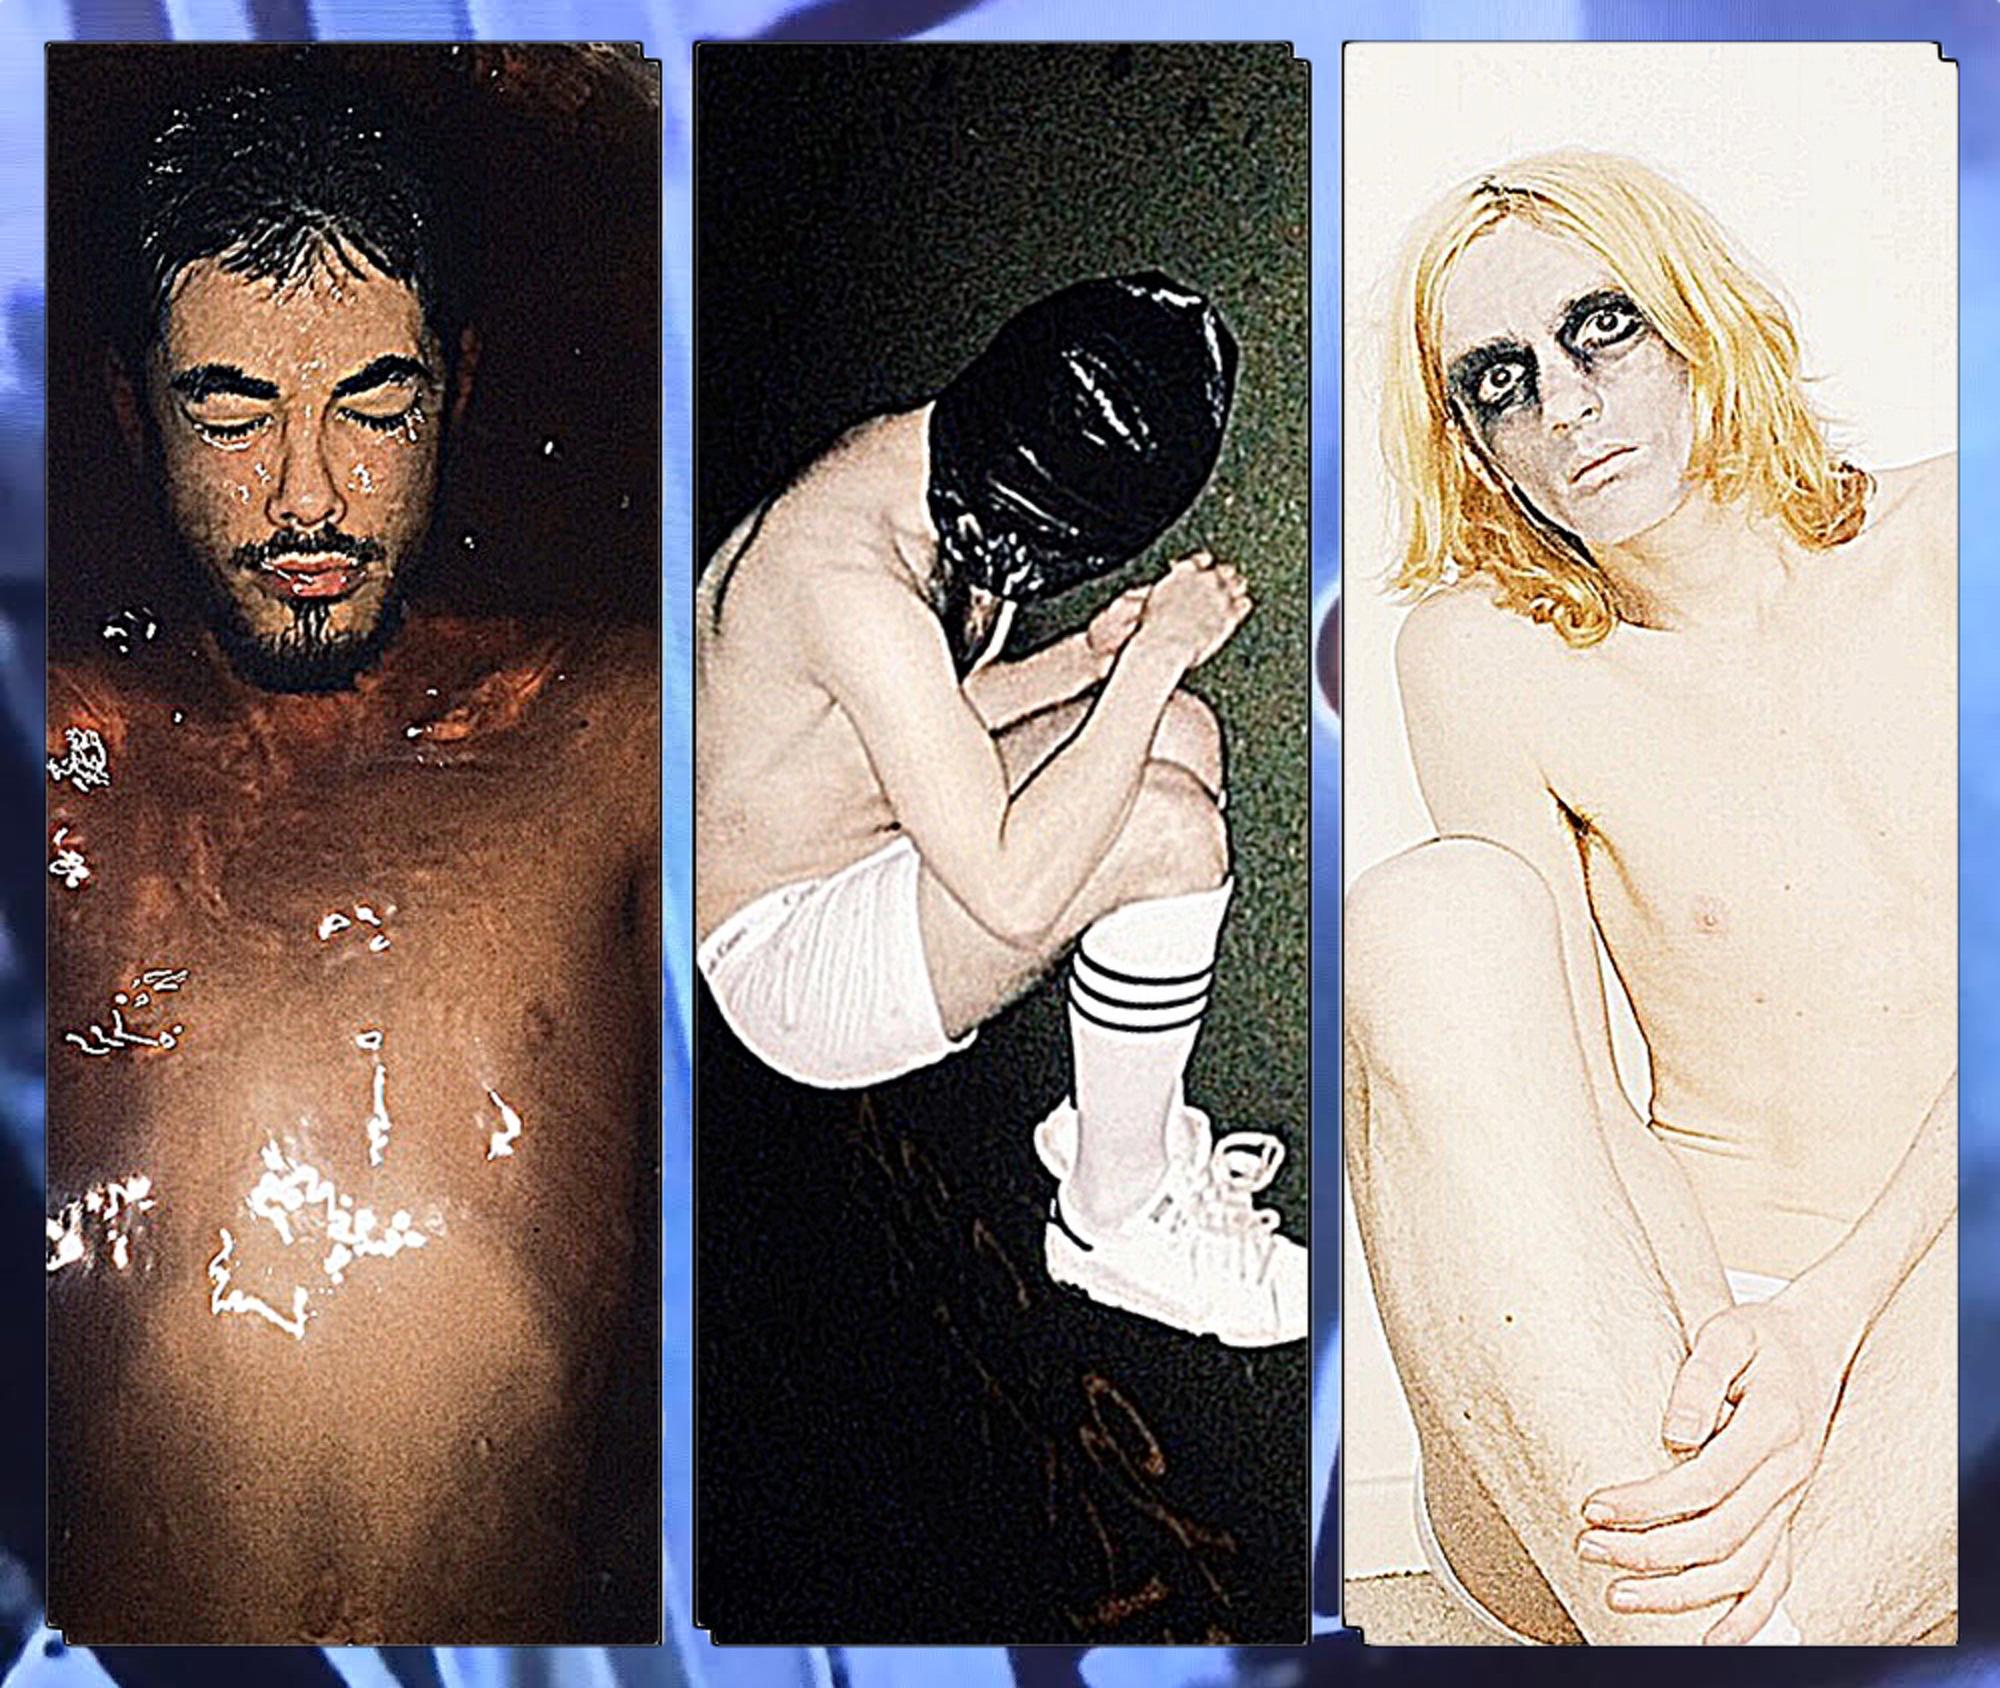 killer albums released this month october music scent savage thrills savagethrills